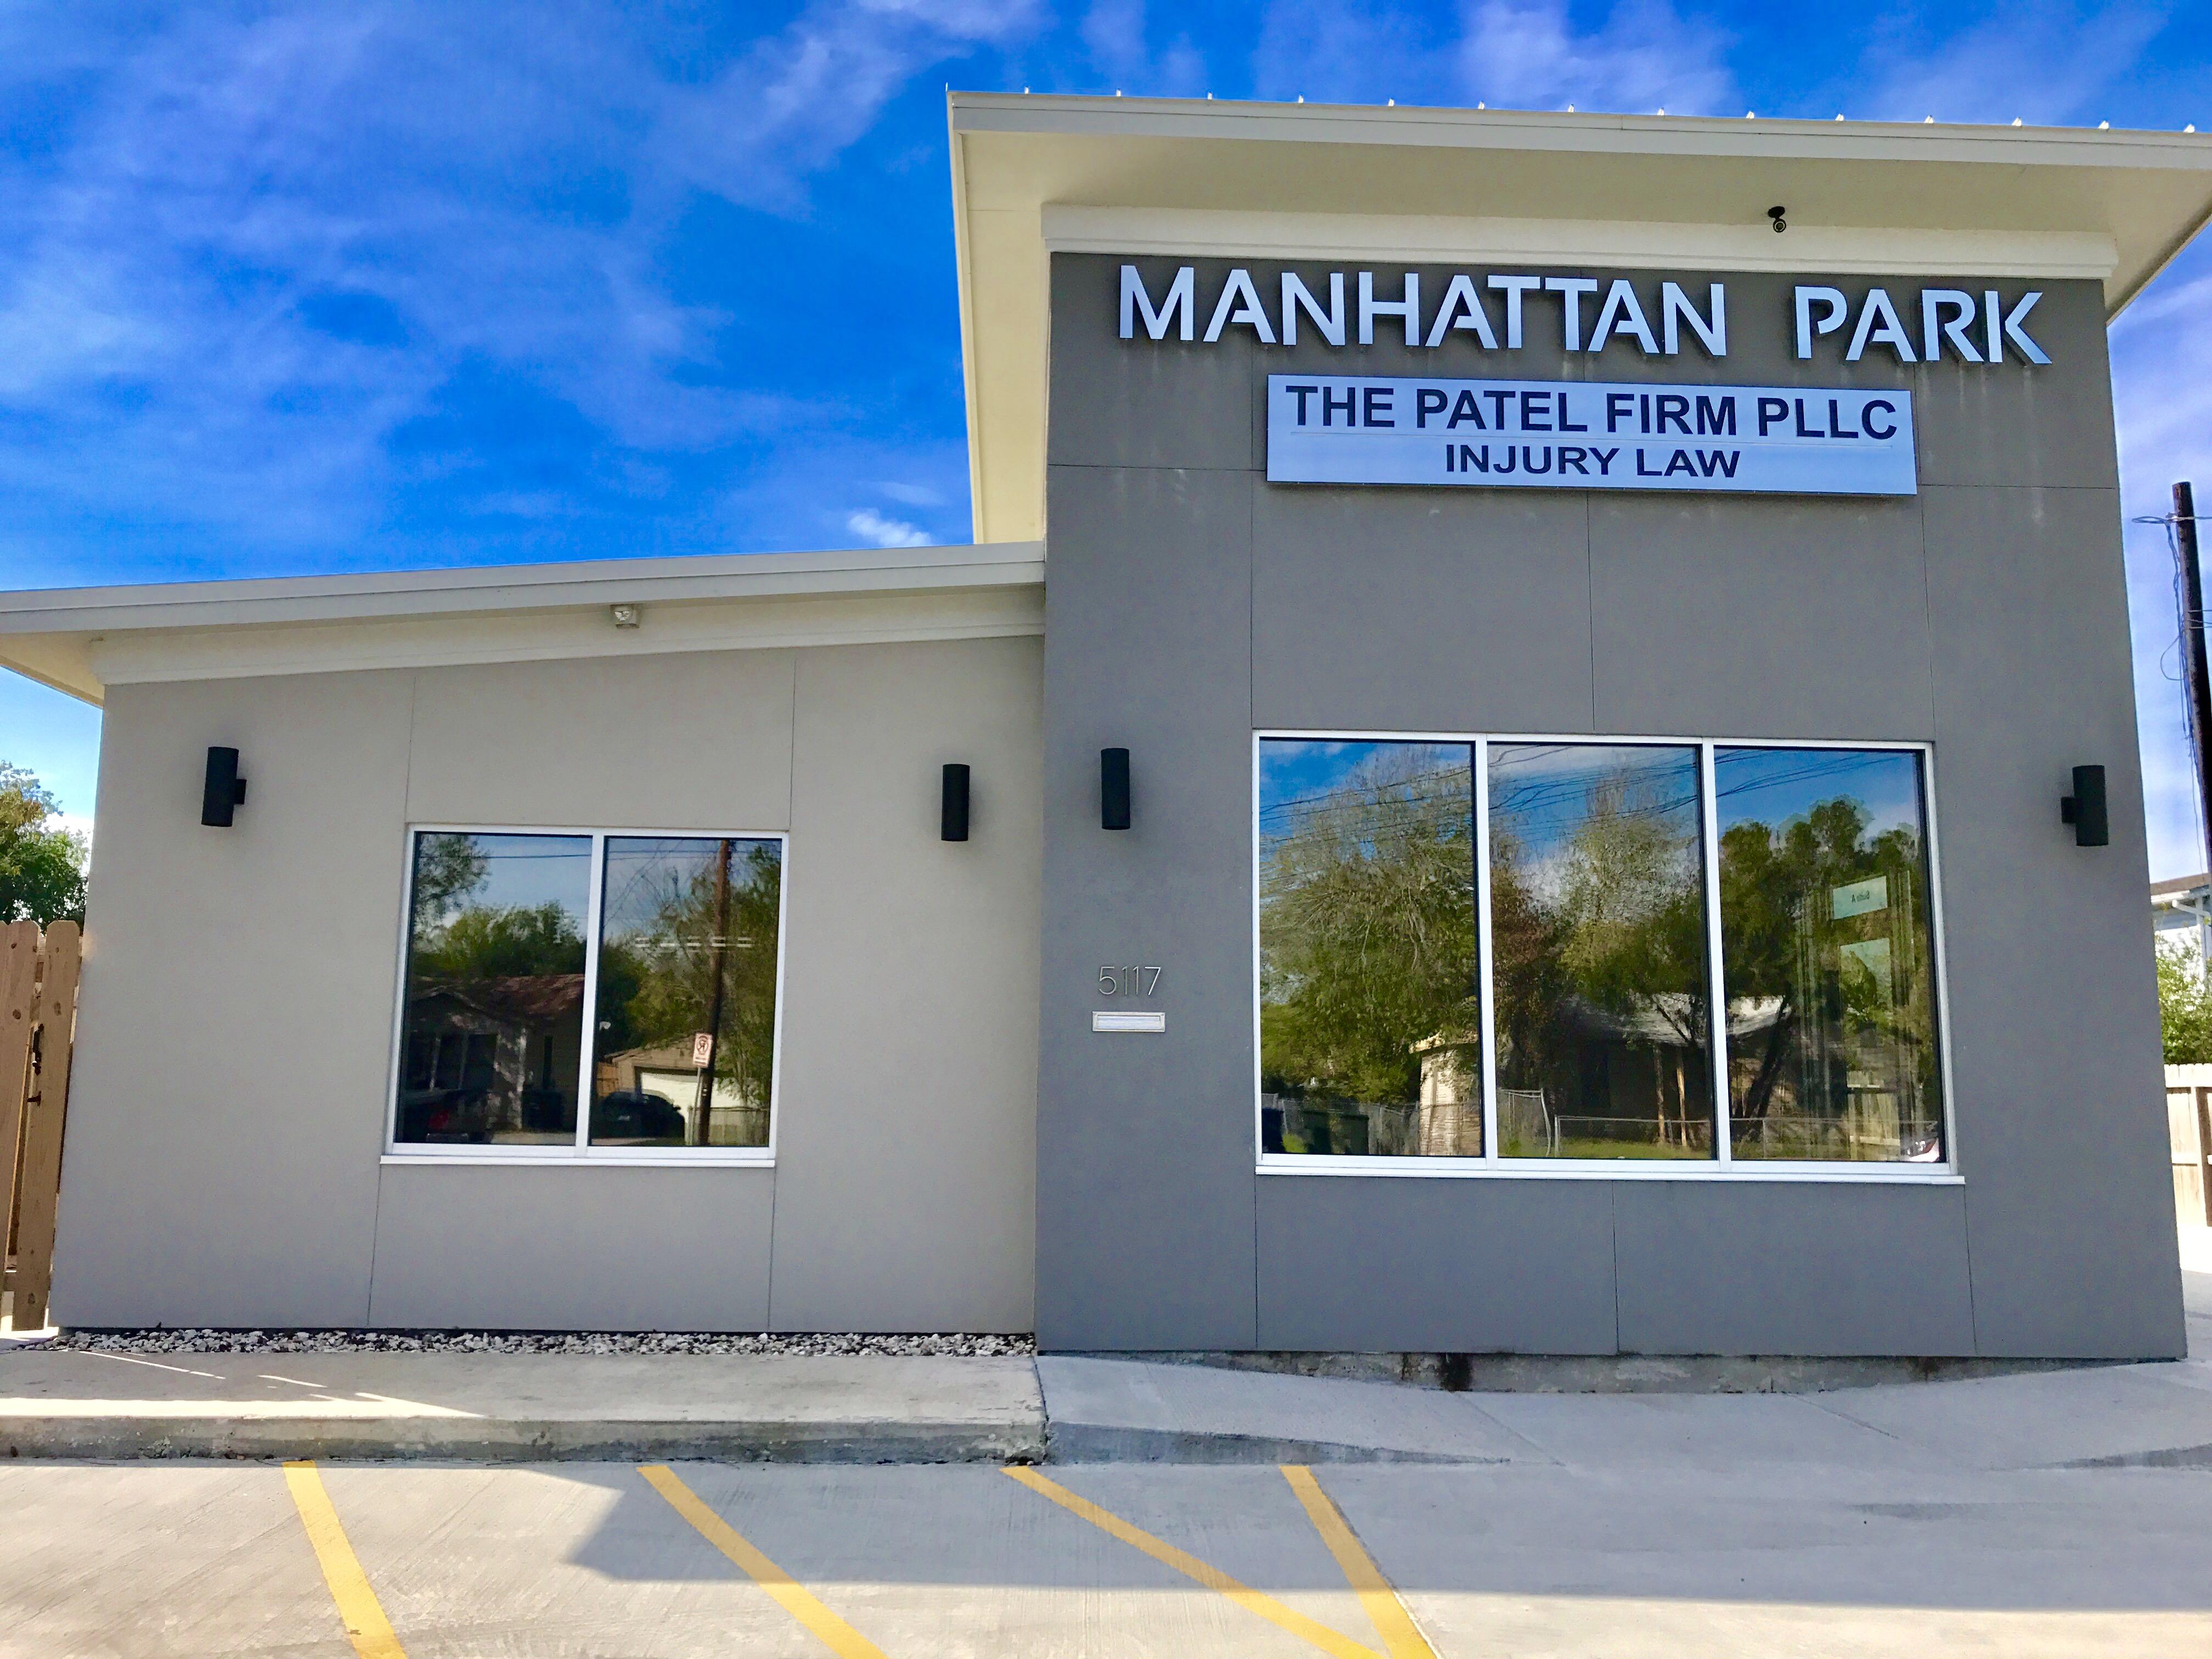 Corpus Christi Personal Injury Attorney - The Patel Firm PLLC